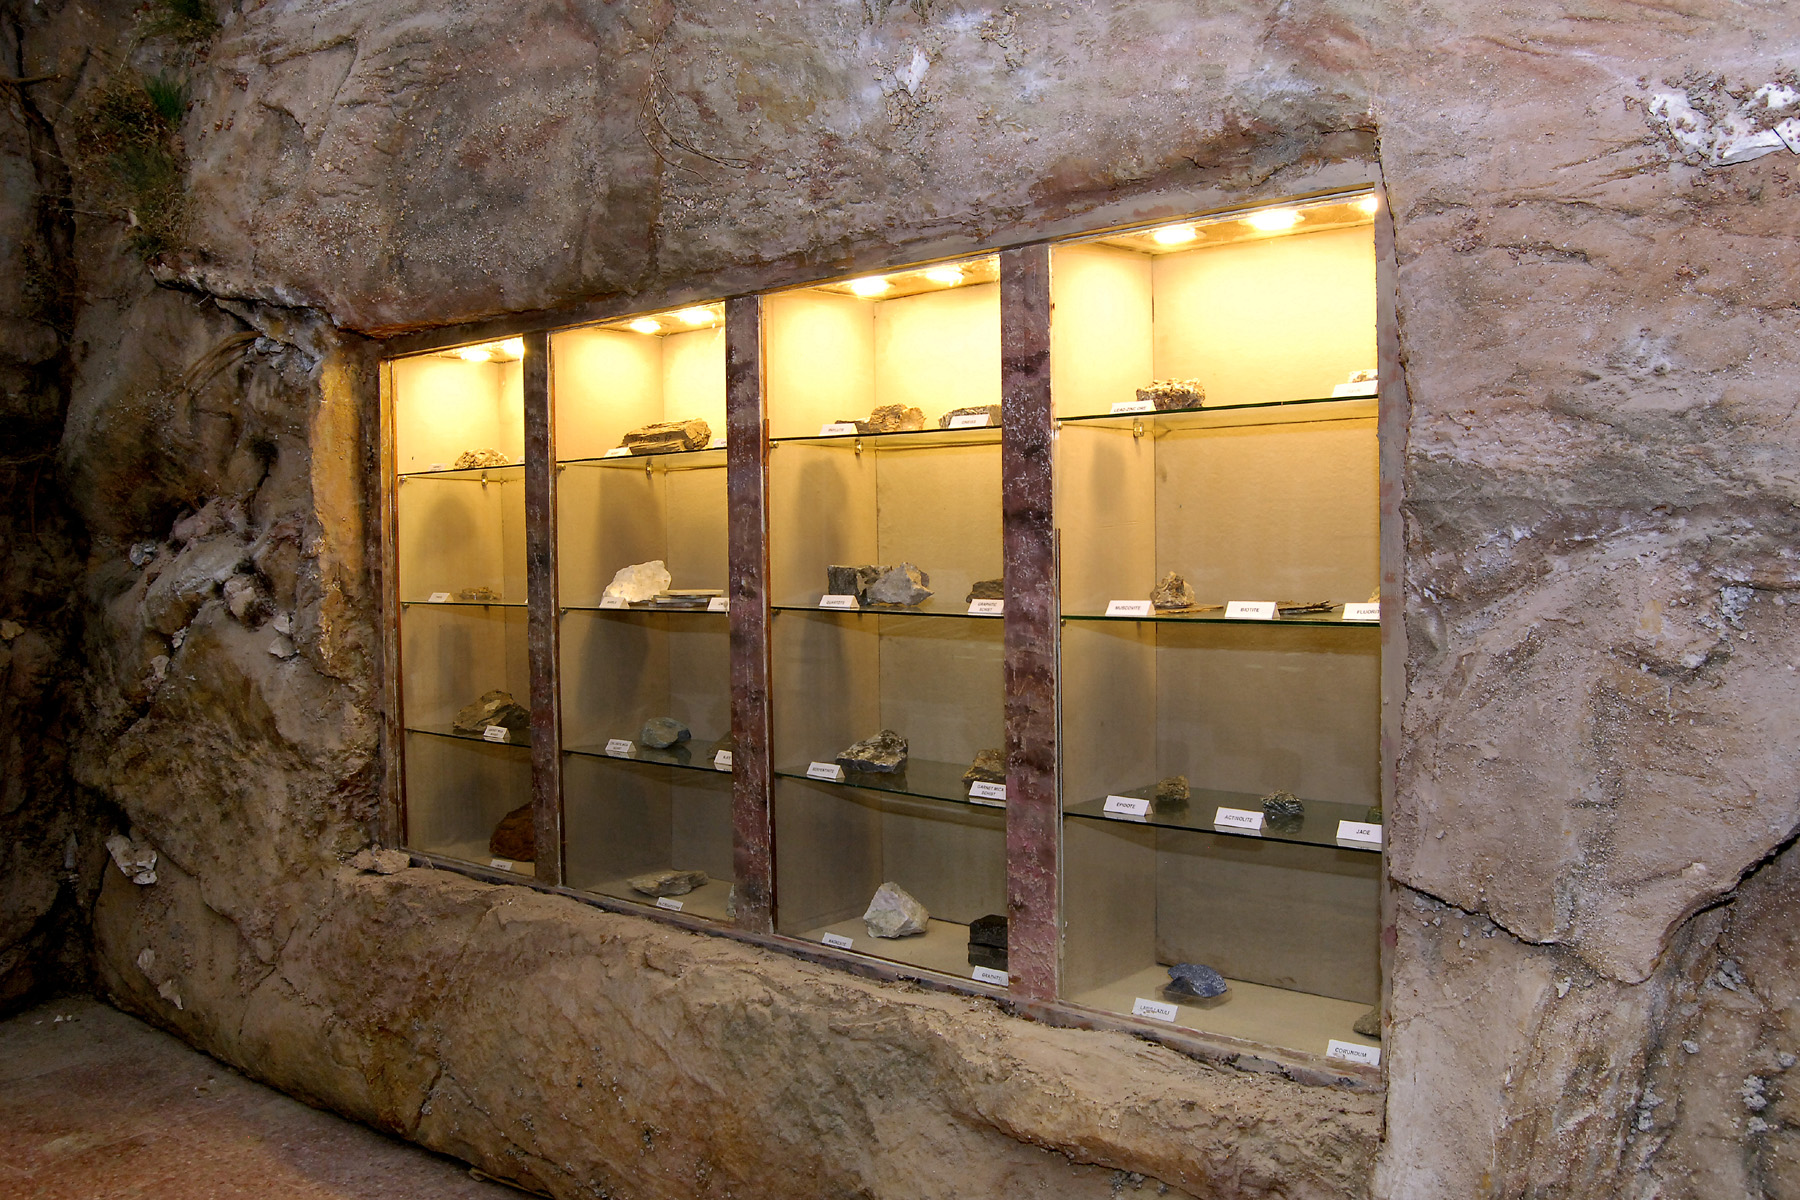 bio ikast Natural History Museum kbh